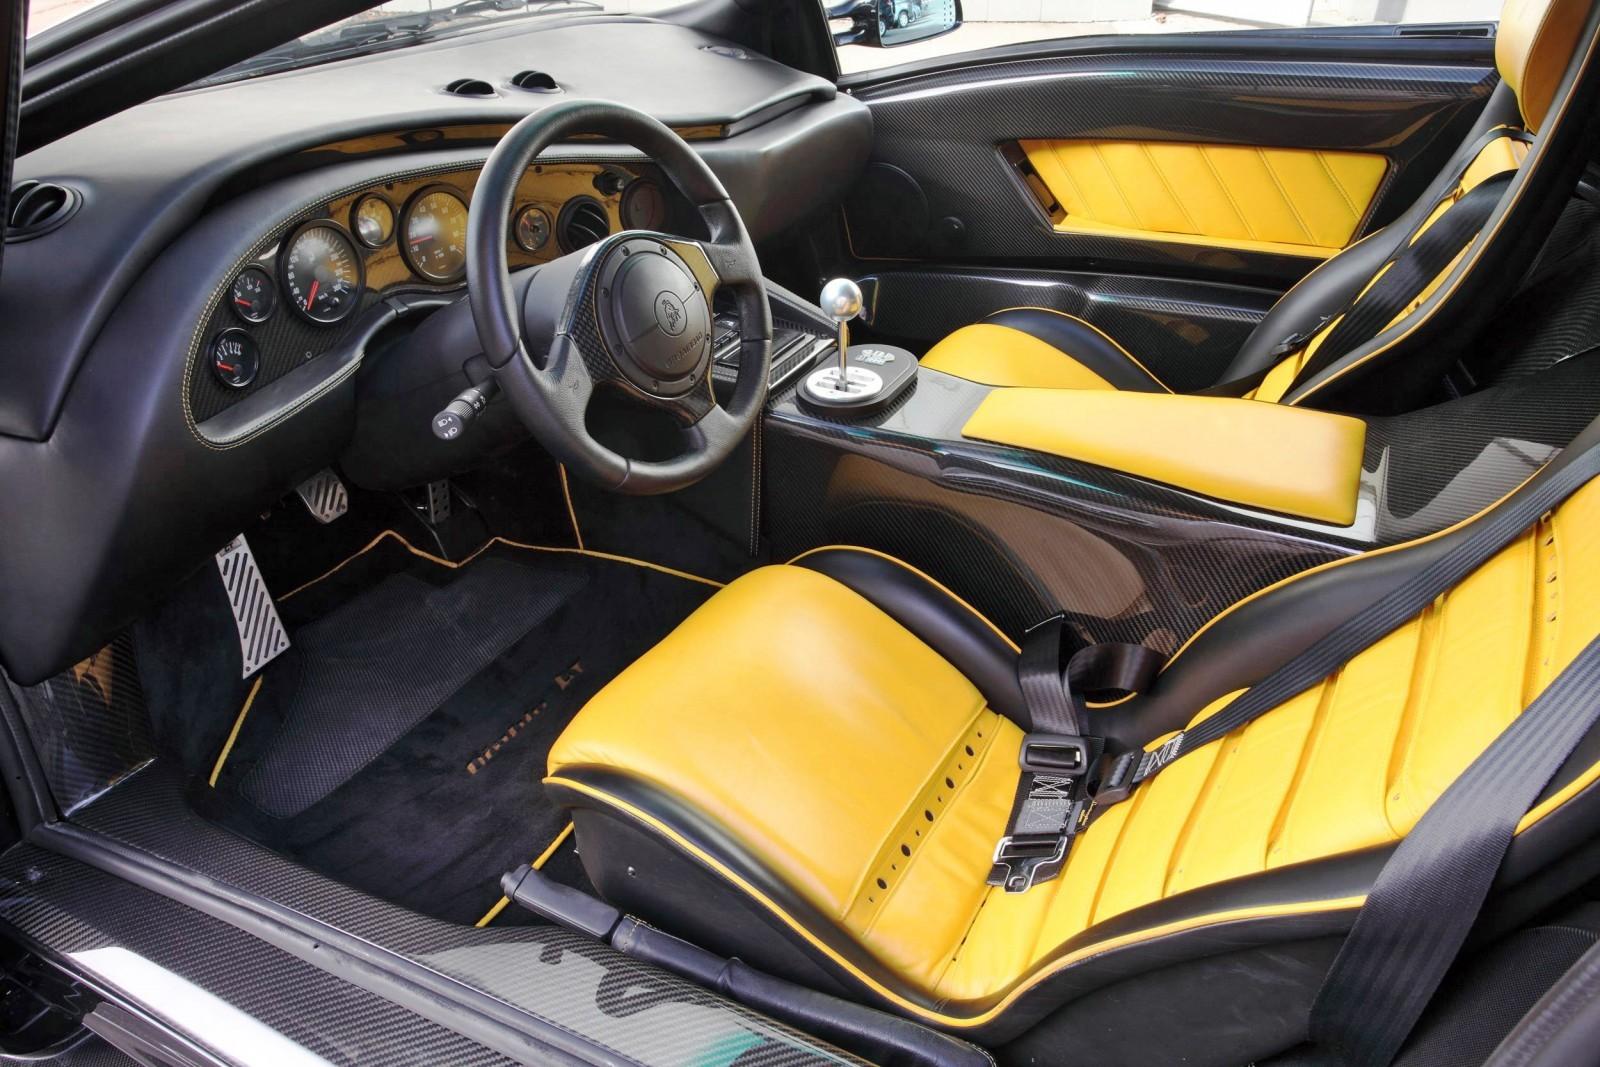 TOPCAR Classics 1999 Lamborghini Diablo GT 26